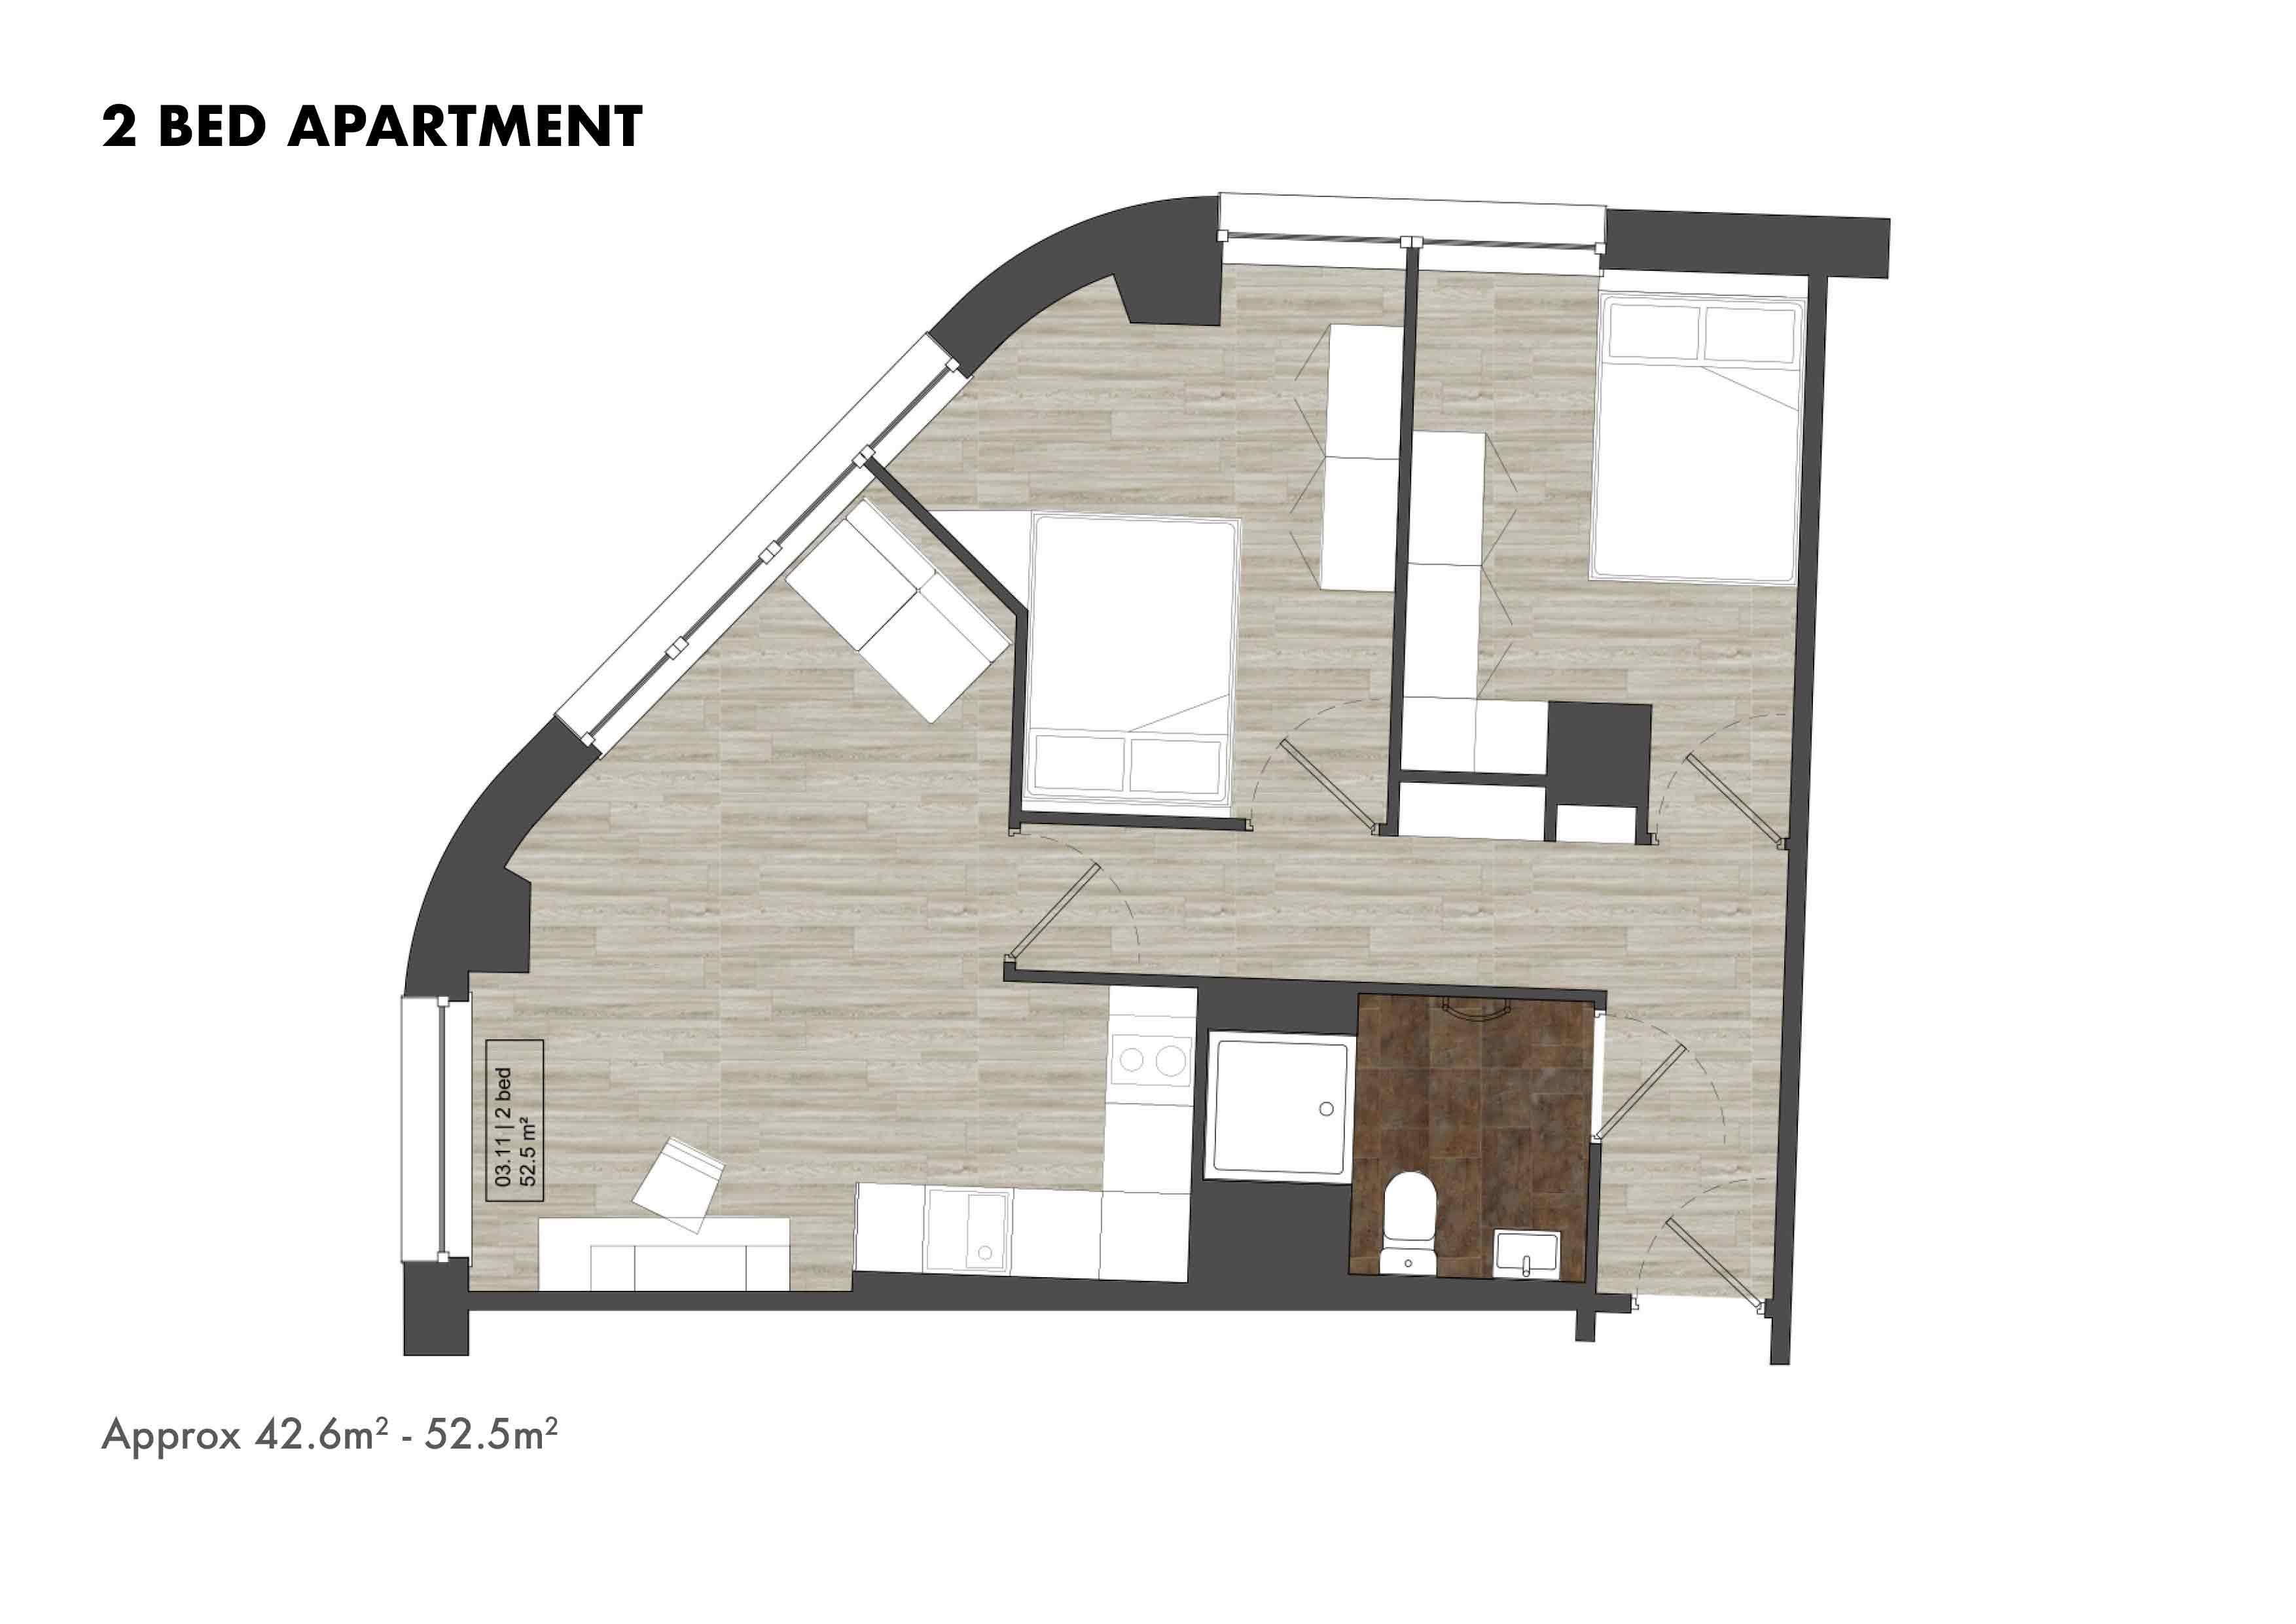 2 Bed Apartment floorplans